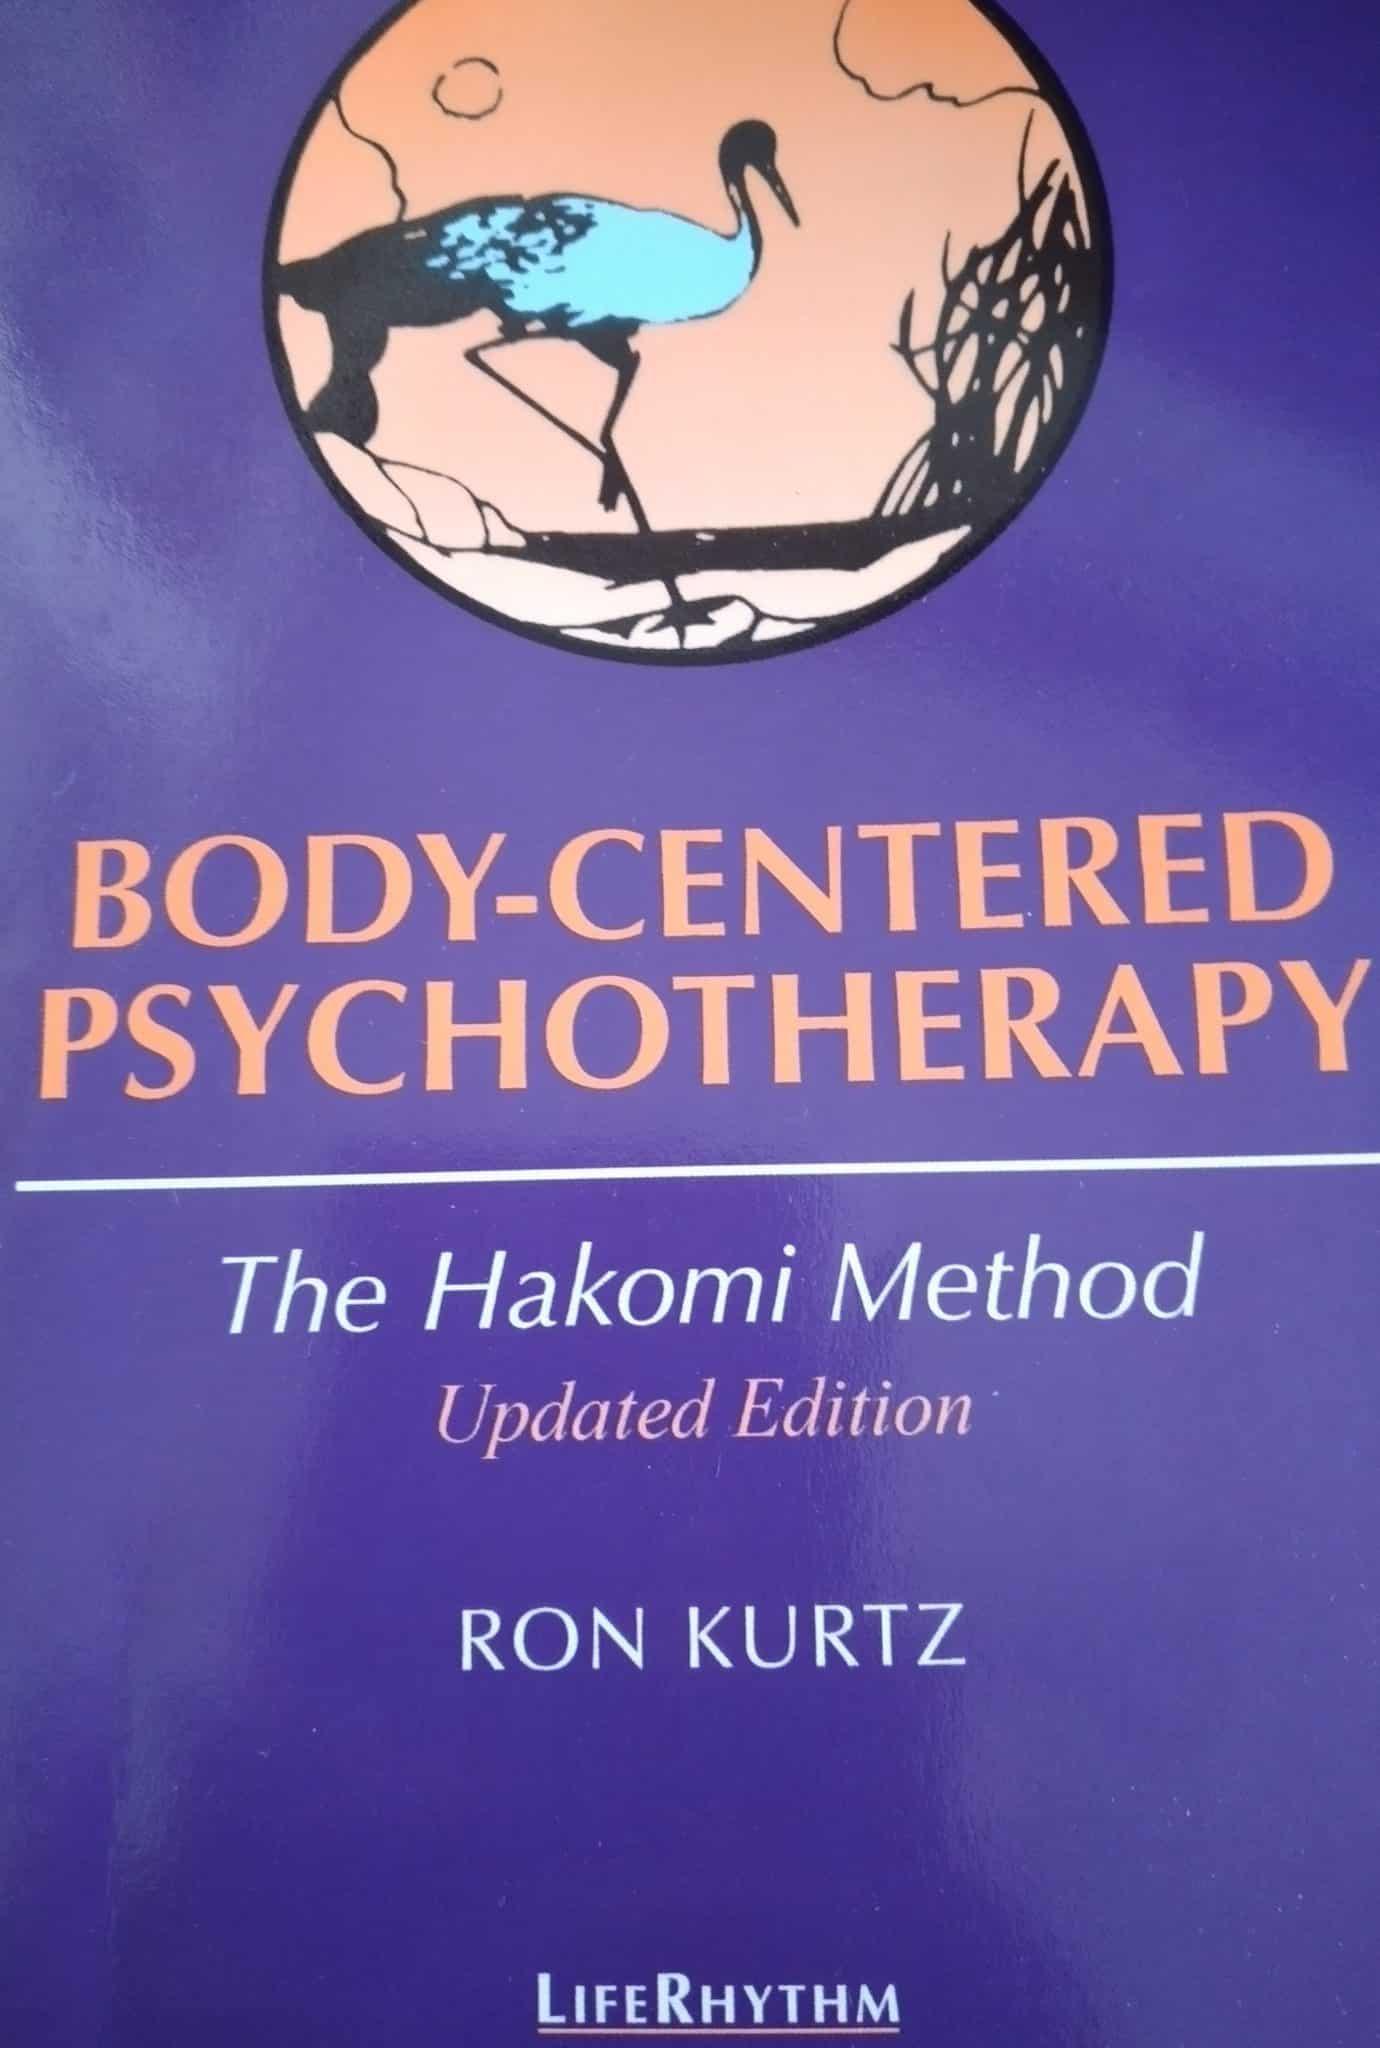 Body-centered Psychotherapy. The Hakomi Method